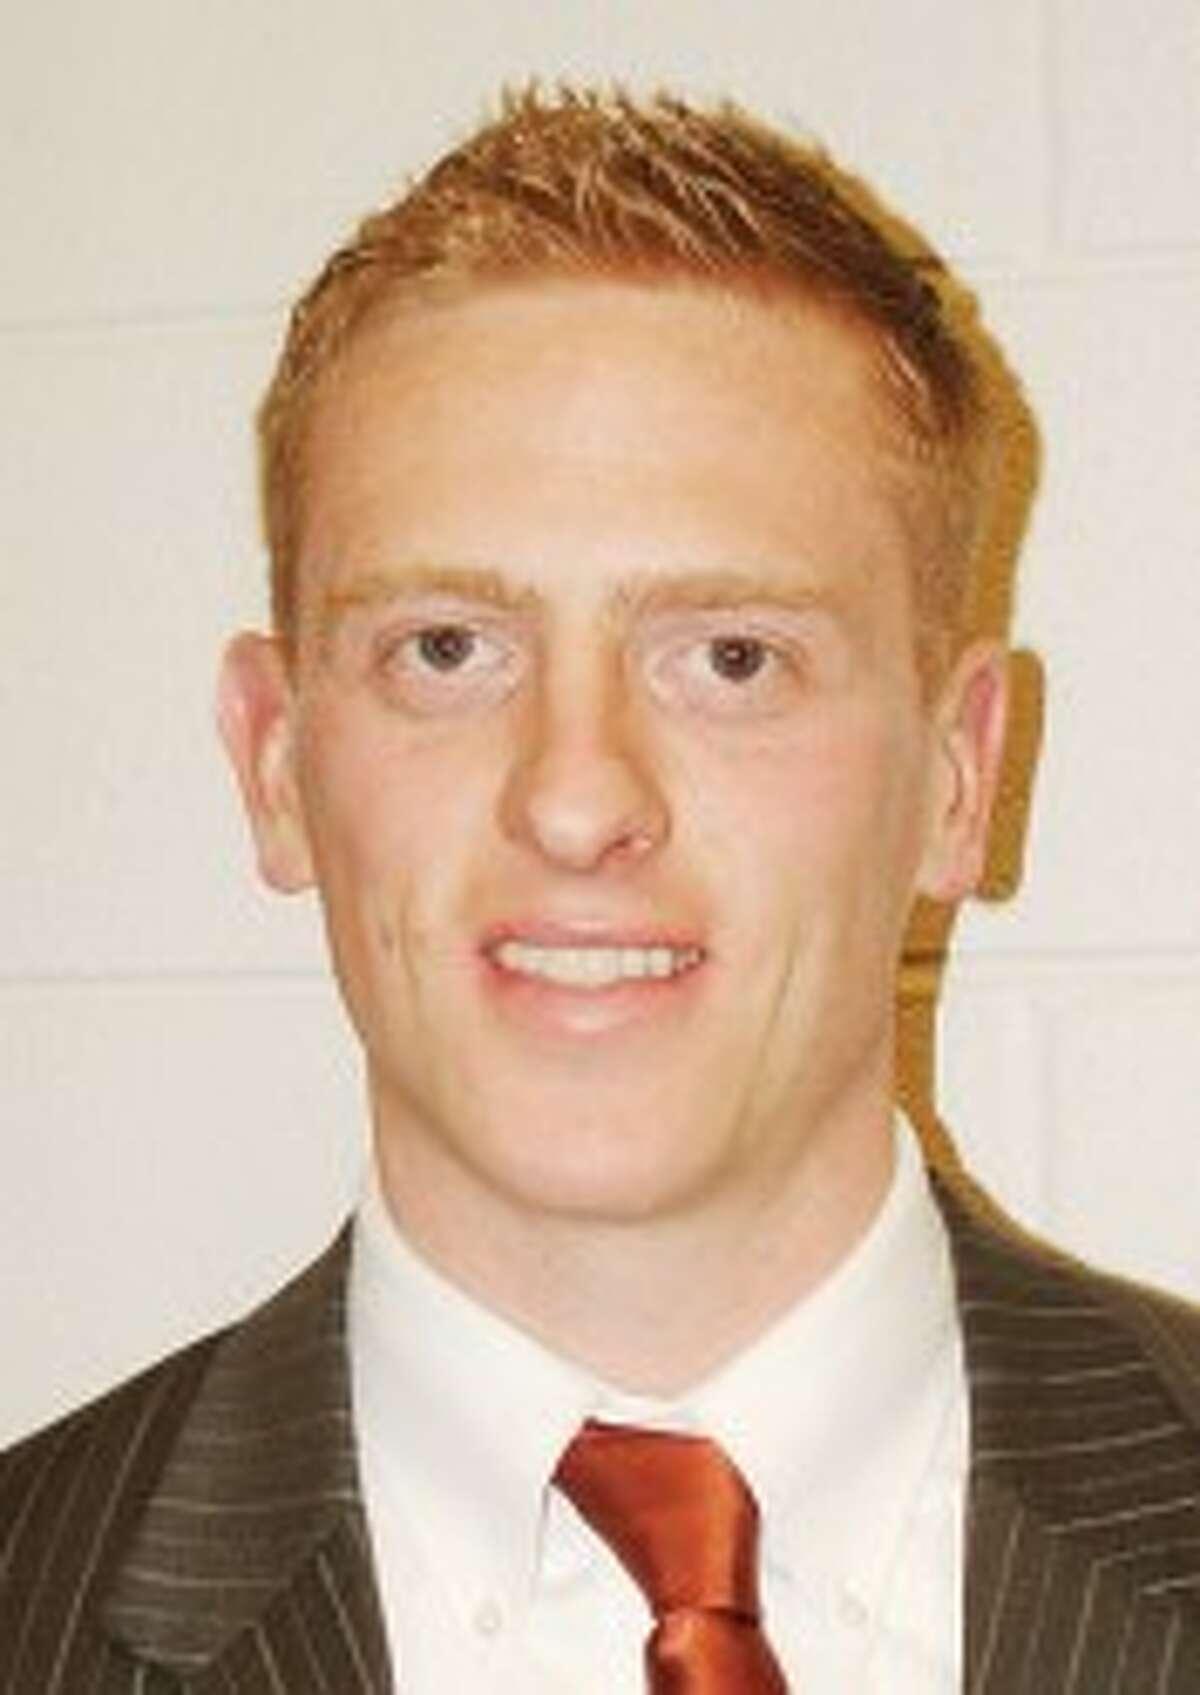 BRPS Finance Director Nick Scheible